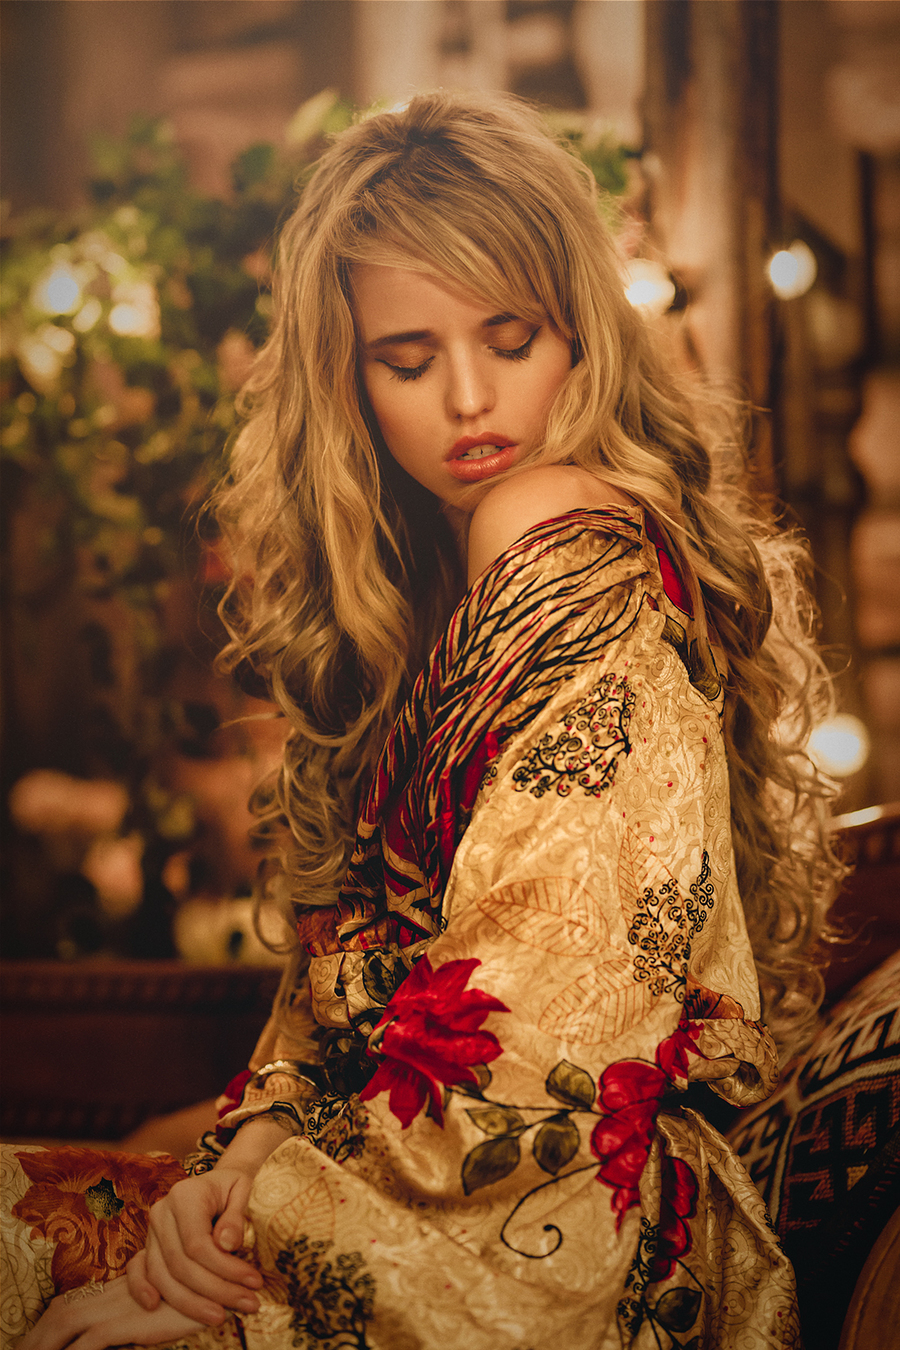 Angel / Photography by Grewy, Model Angel., Post processing by Grewy, Stylist ❀ Chiara Elisabetta, Taken at The Hacienda / Uploaded 9th November 2019 @ 02:17 PM